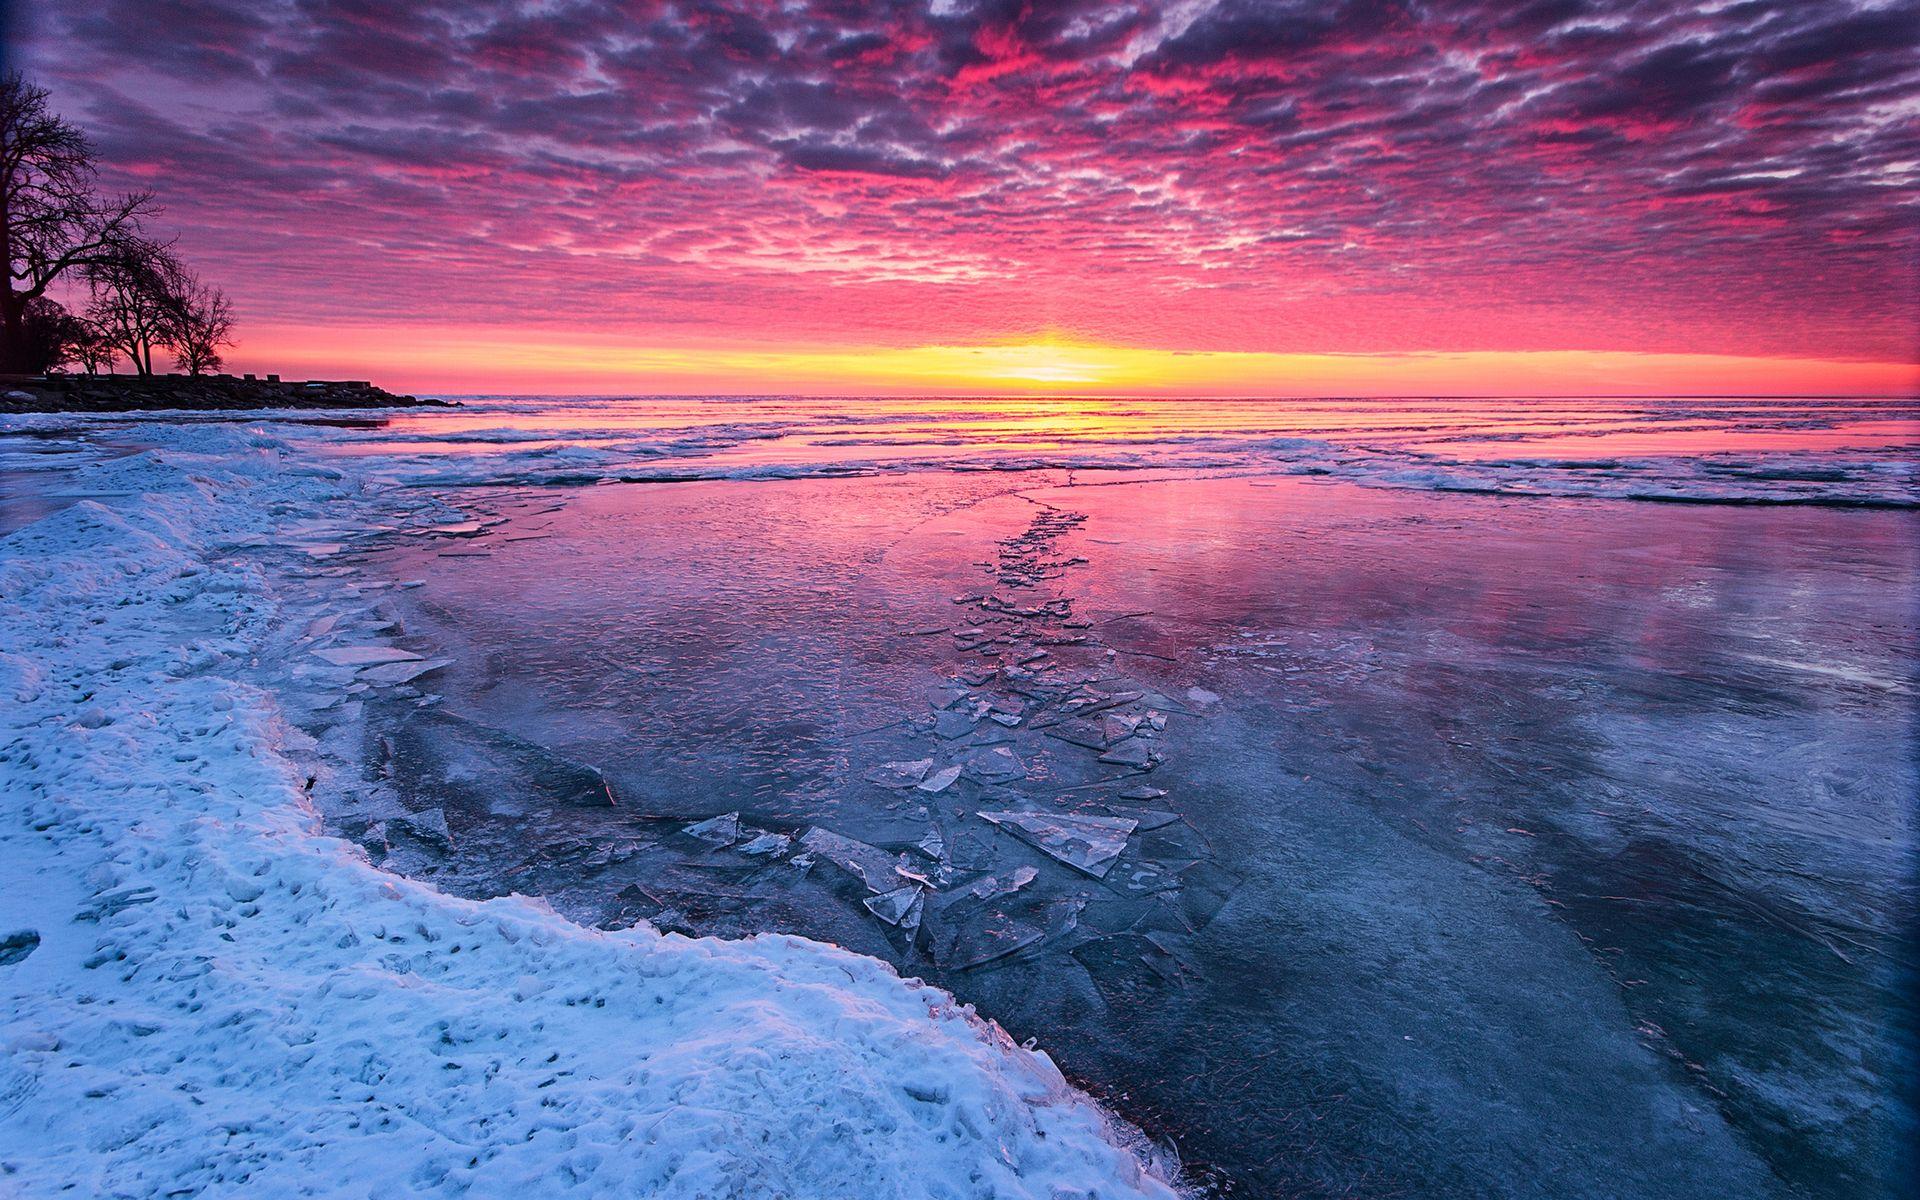 Amazing Colors Sunset Wallpaper Beach Wallpaper Winter Sunset Wallpaper sunset lake ice evening sky